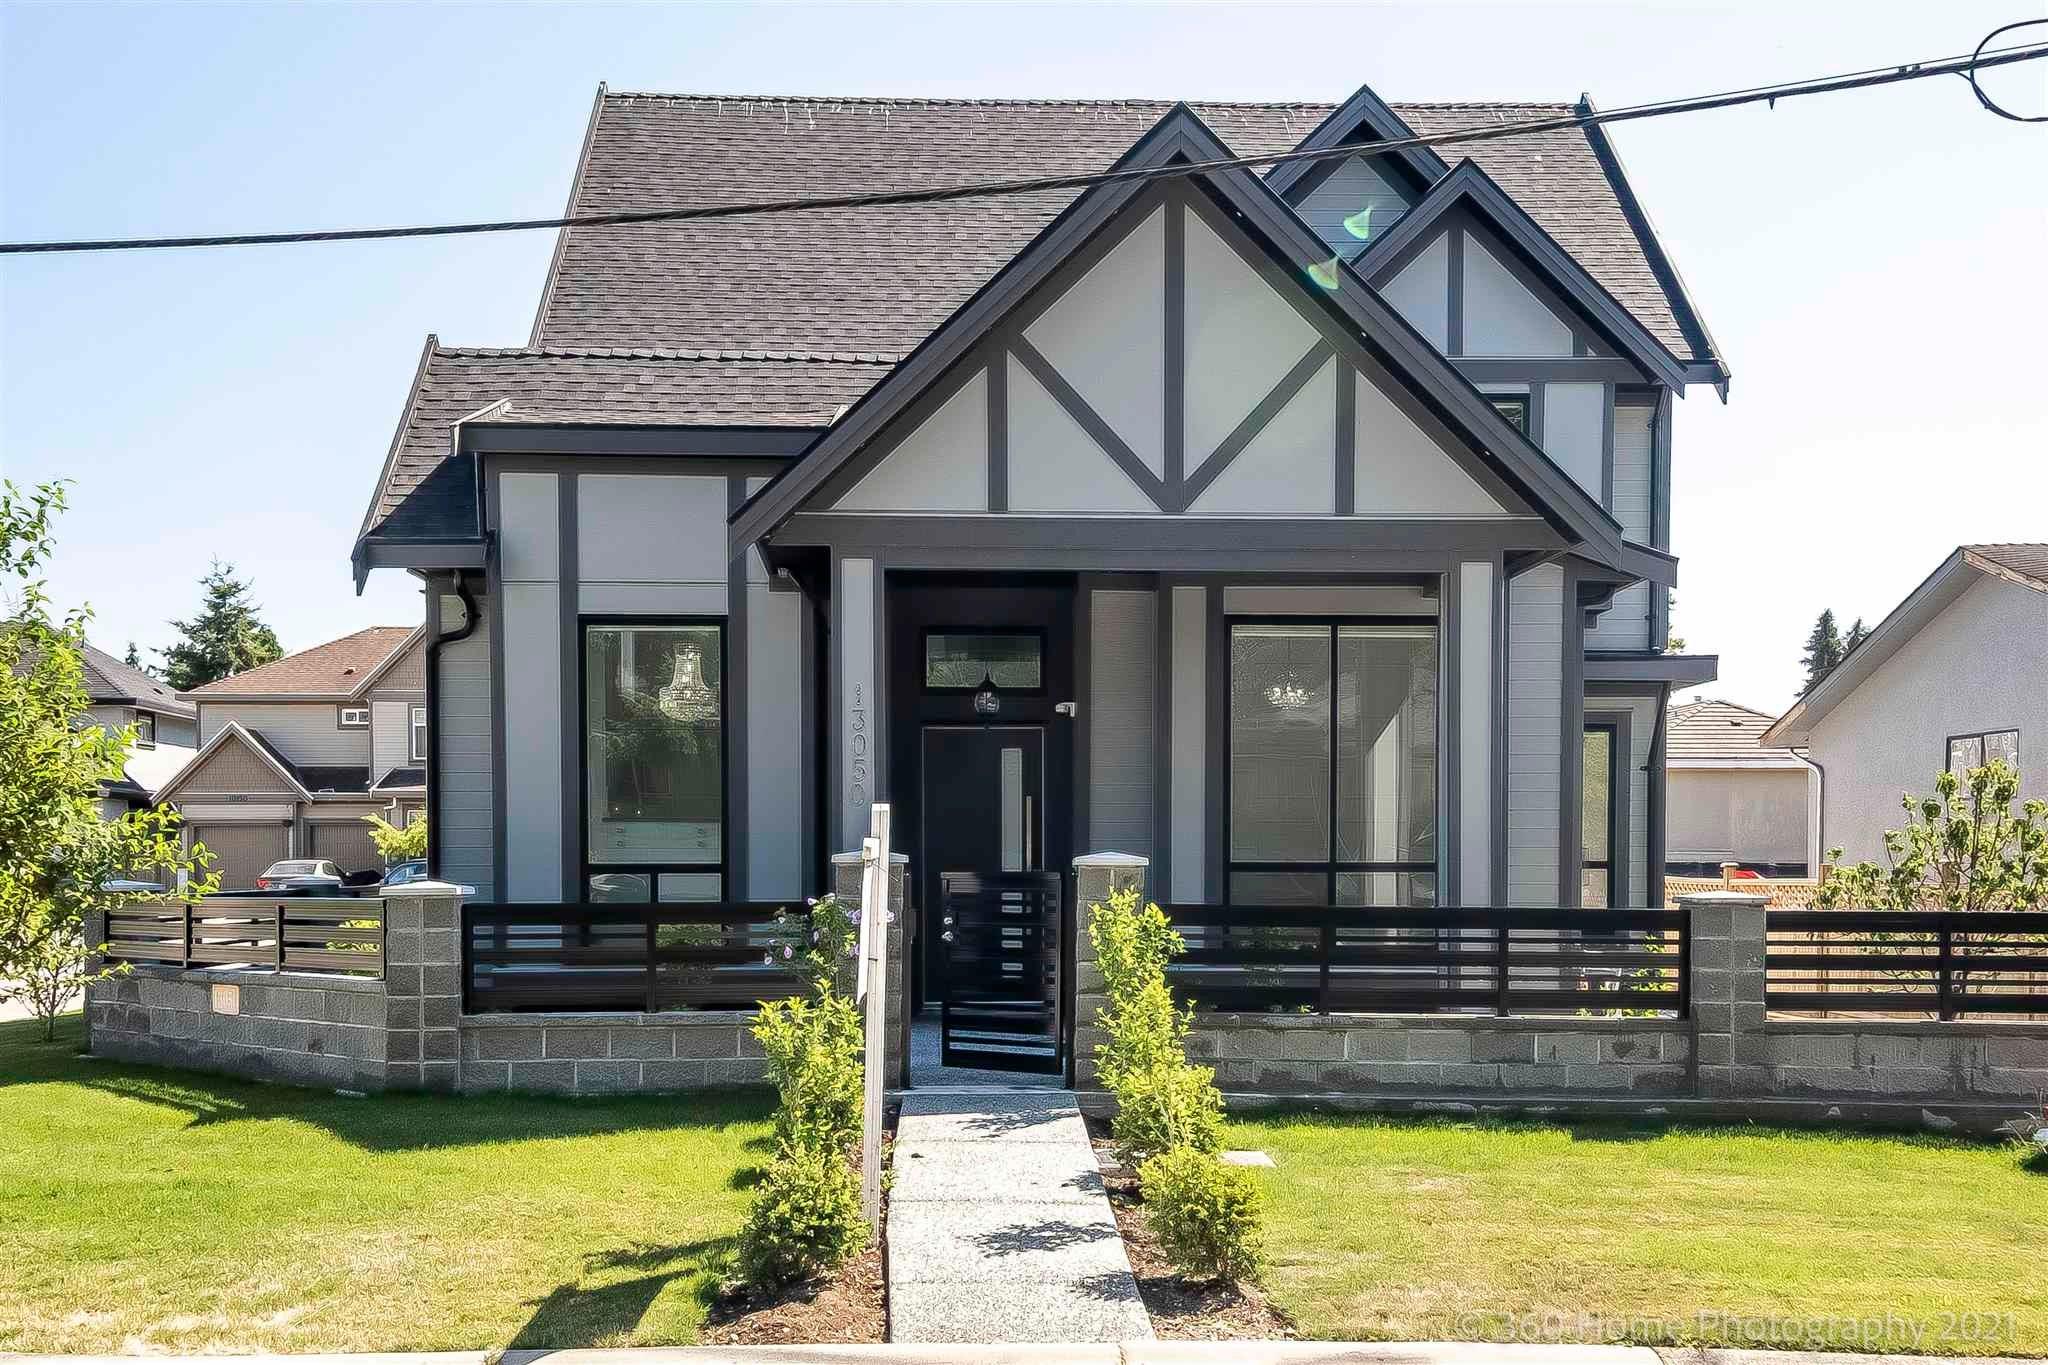 13050 101B AVENUE - Cedar Hills House/Single Family for sale, 5 Bedrooms (R2602208)